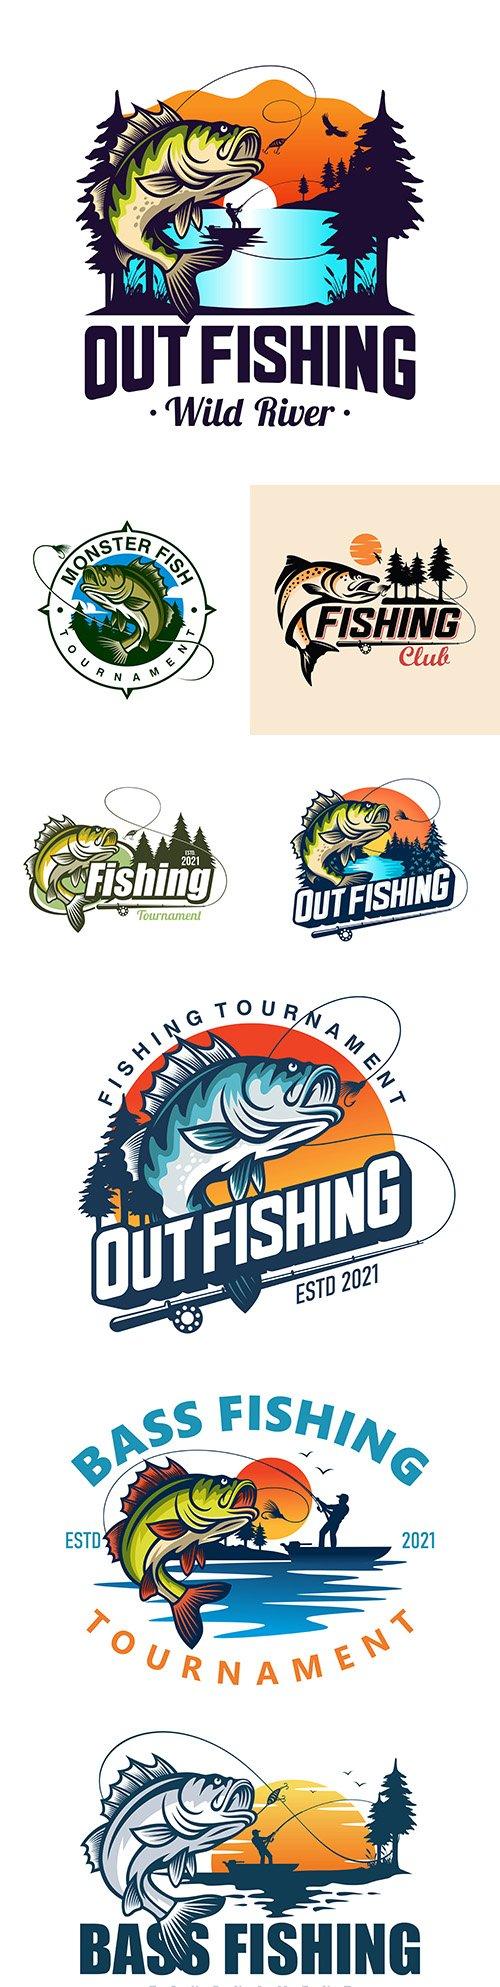 Bass fishing logos design company business